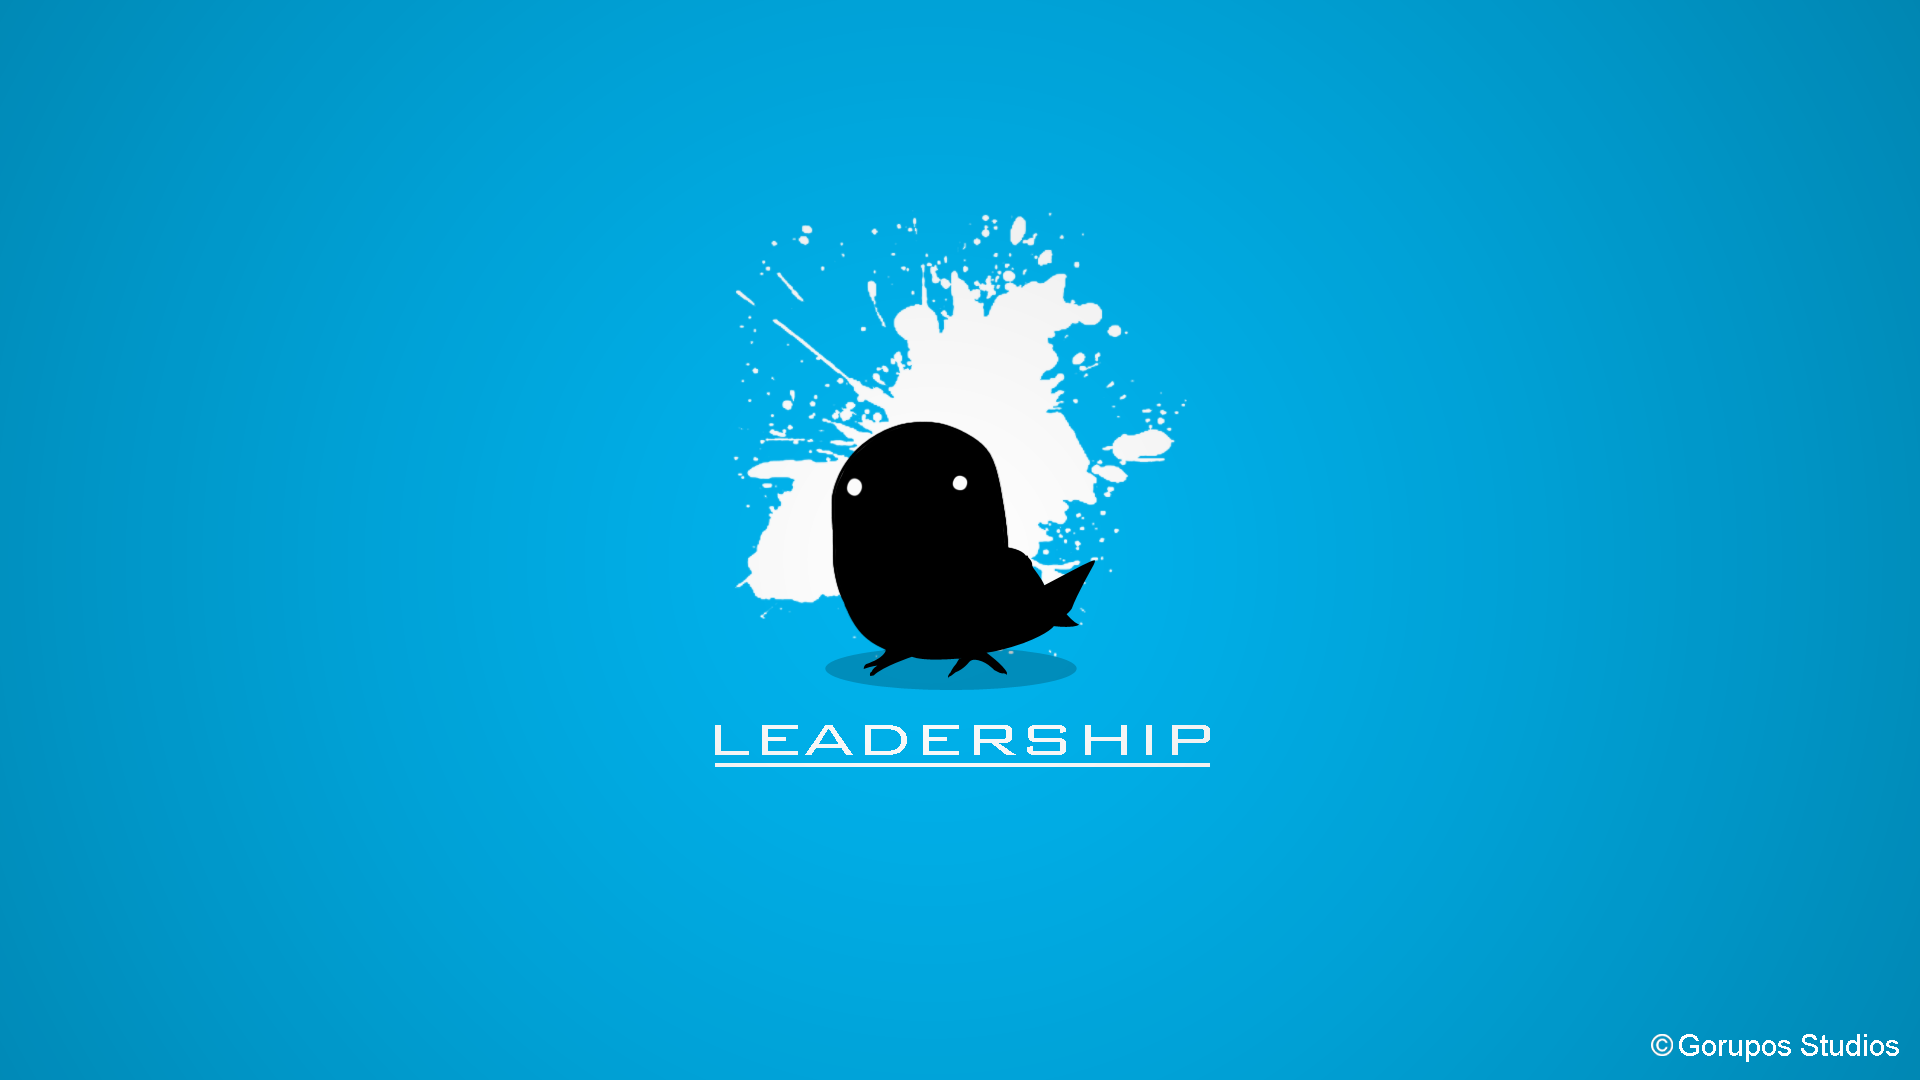 Leadership Wallpaper wwwpixsharkcom   Images Galleries 1920x1080